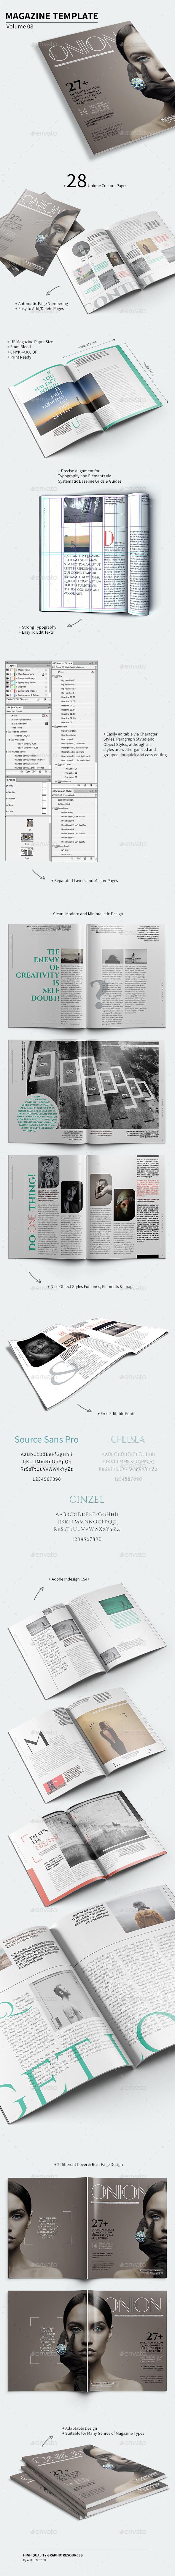 Magazine Template - Volume 08 - Magazines Print Templates